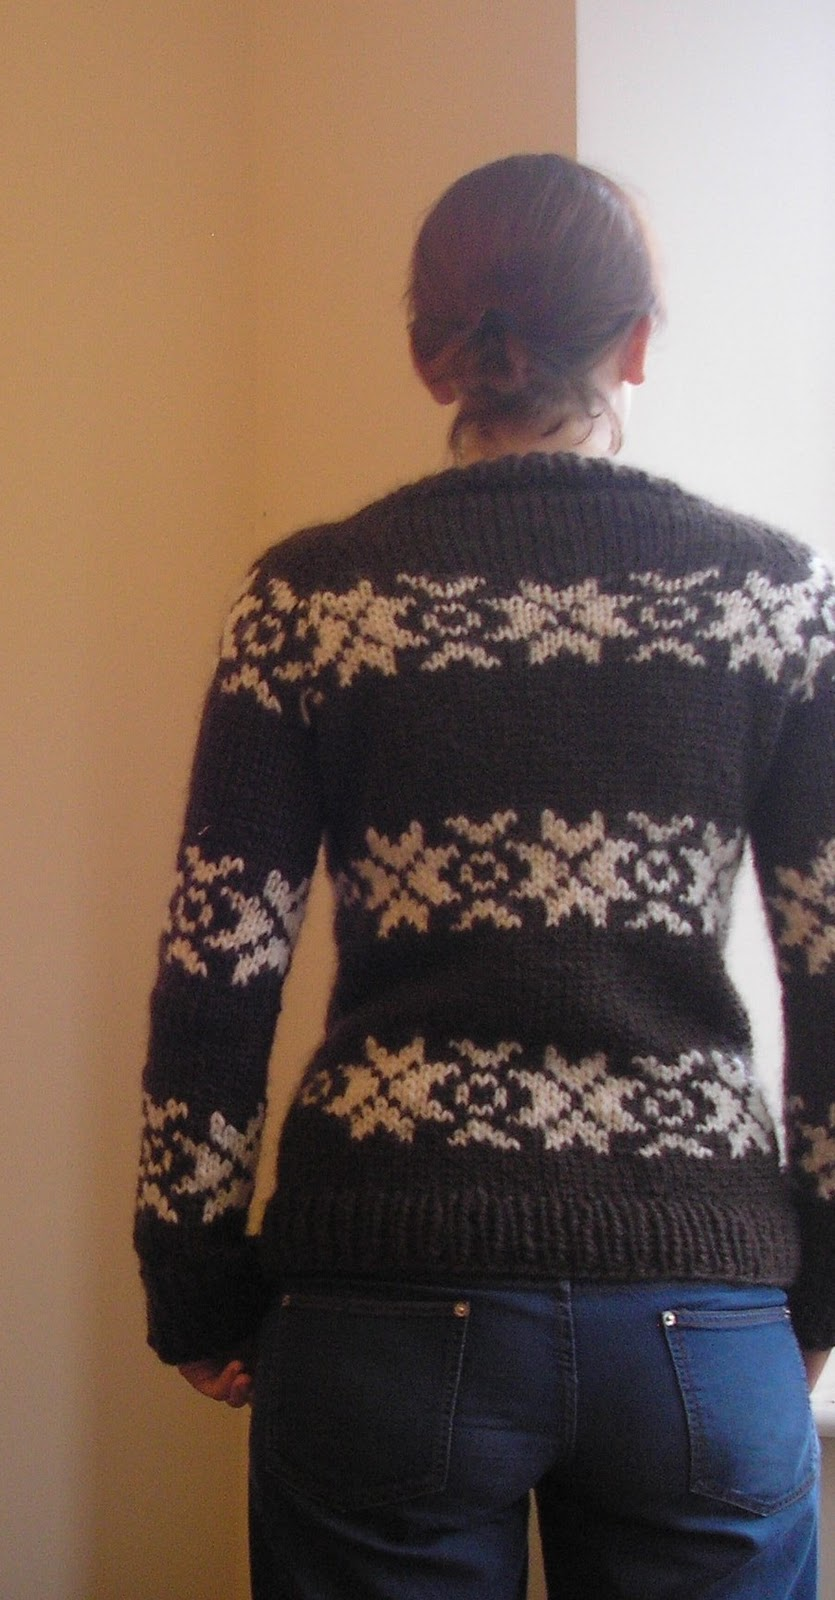 Knitting Pattern For The Killing Jumper : My Killing Jumper